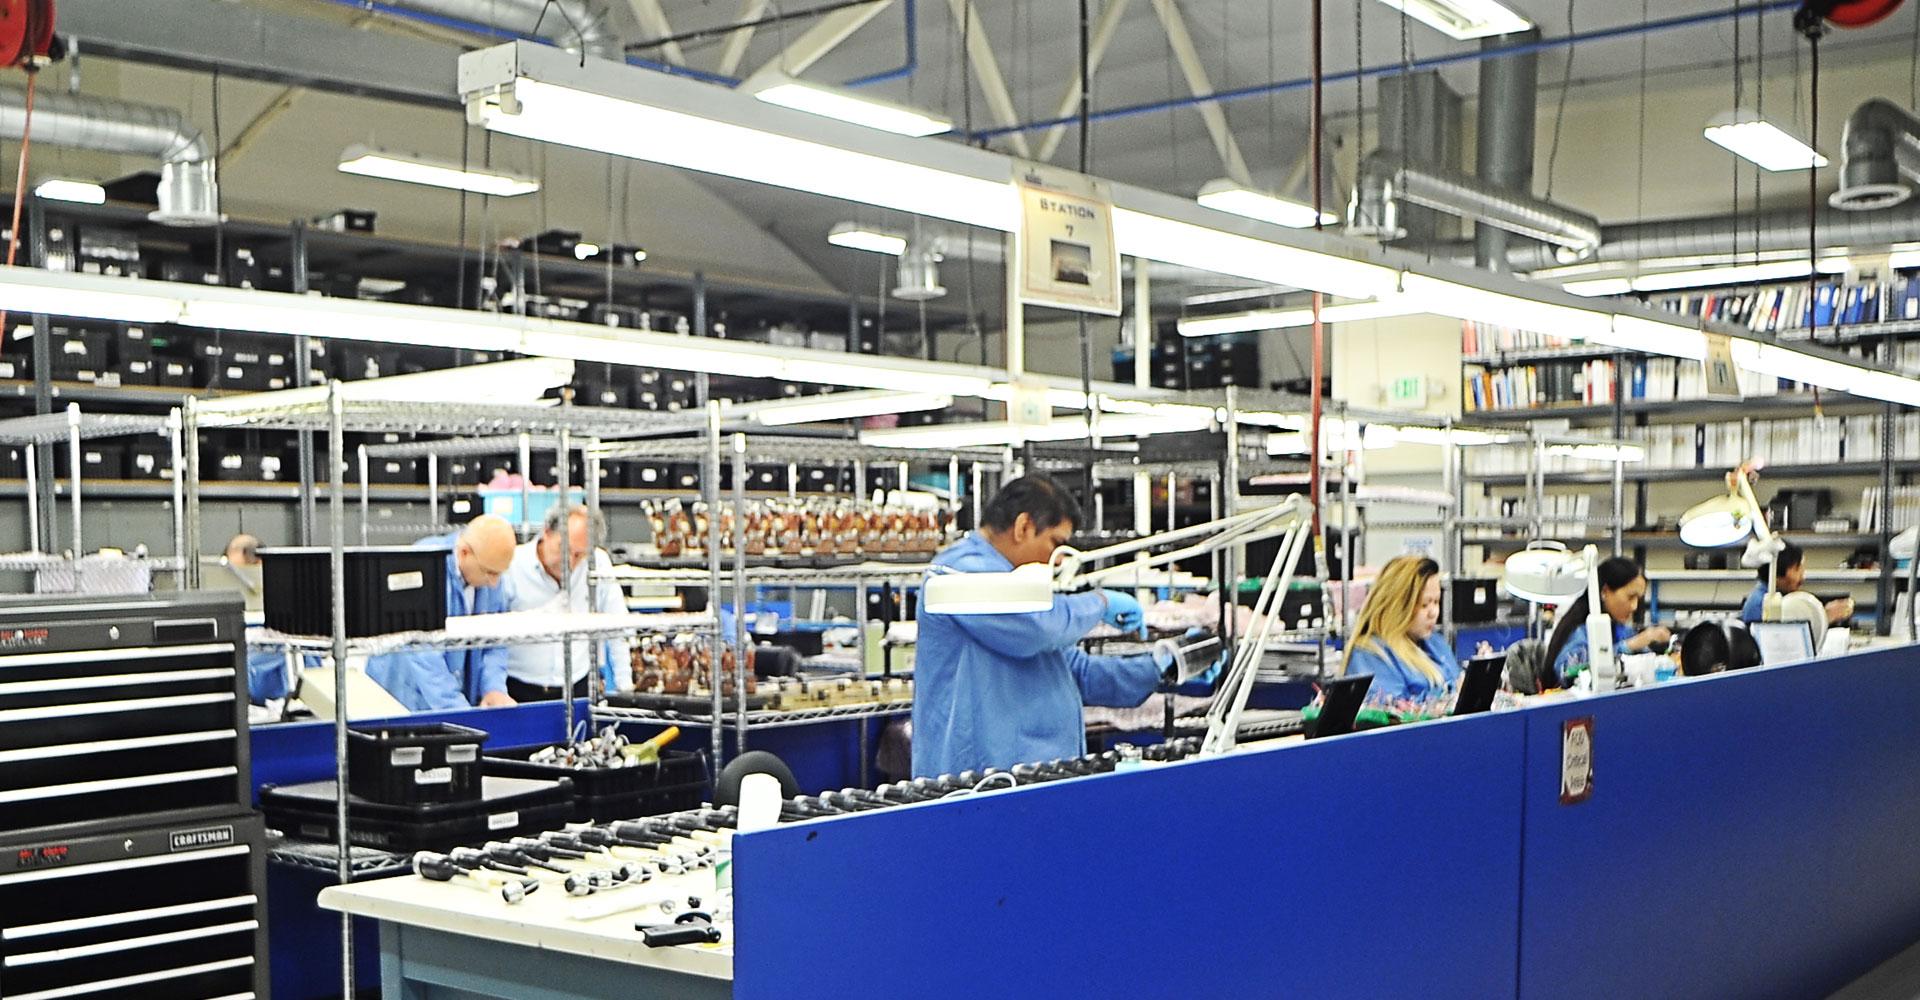 Engineered Magnetics - Aerospace Component Manufacturer: Facility Slide 5